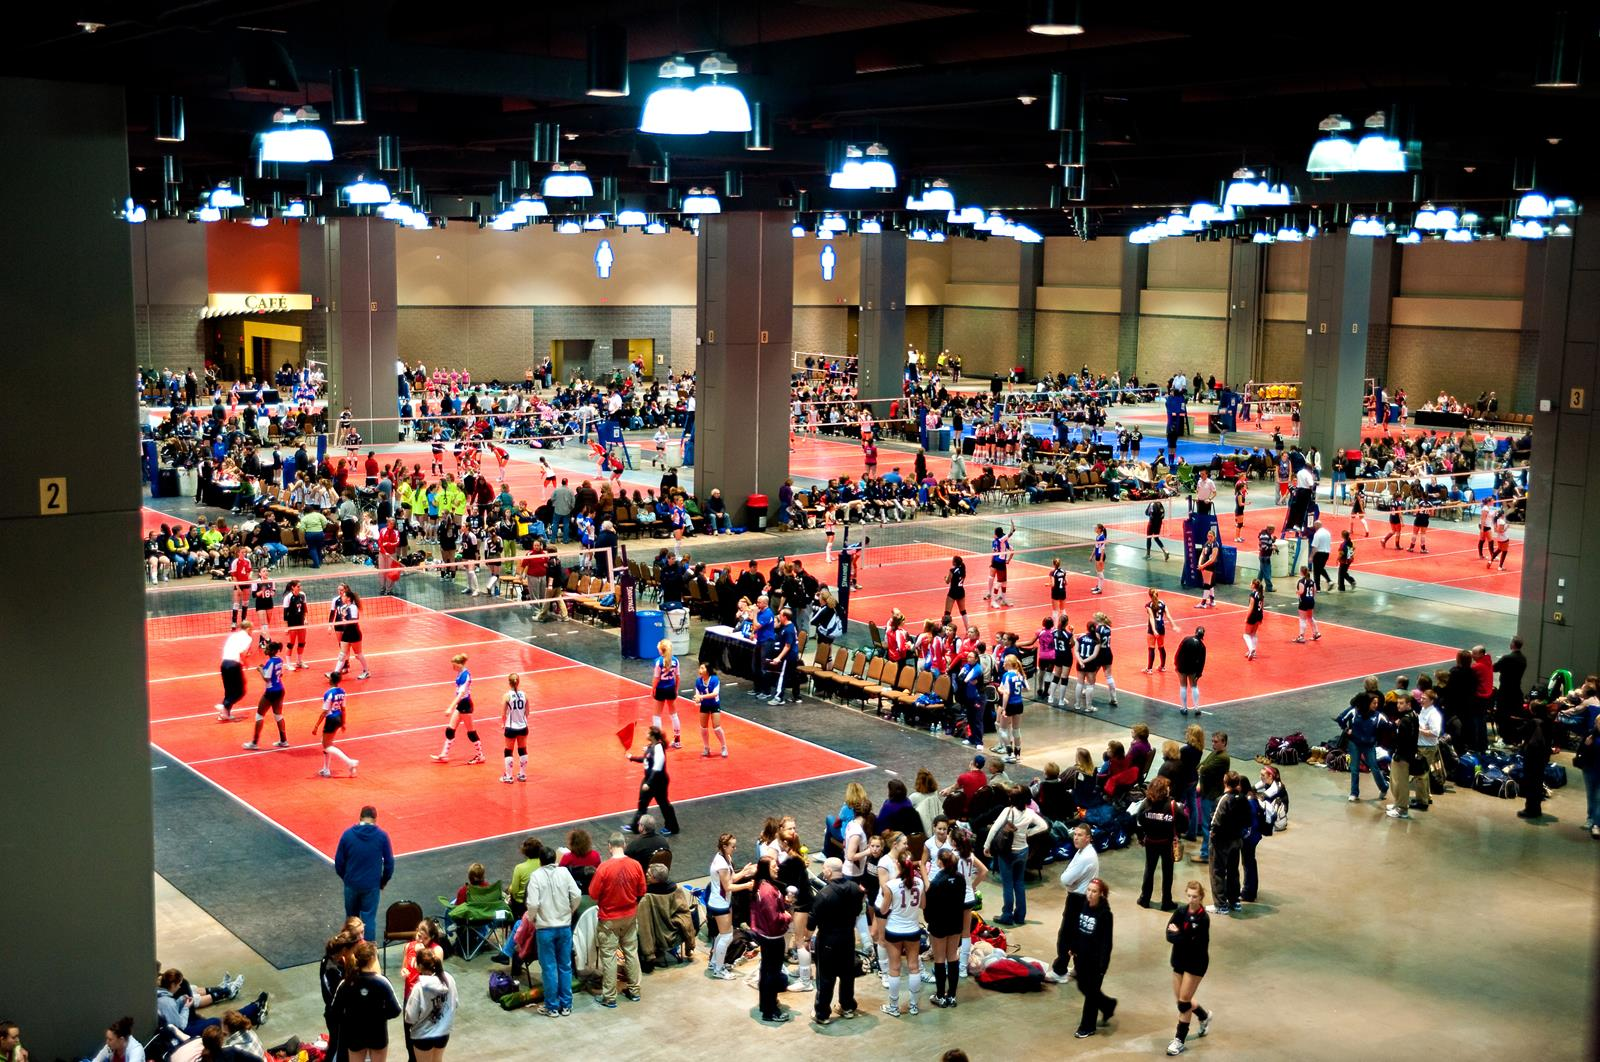 NERVA (Northeast Regional Volleyball Association) Winterfest